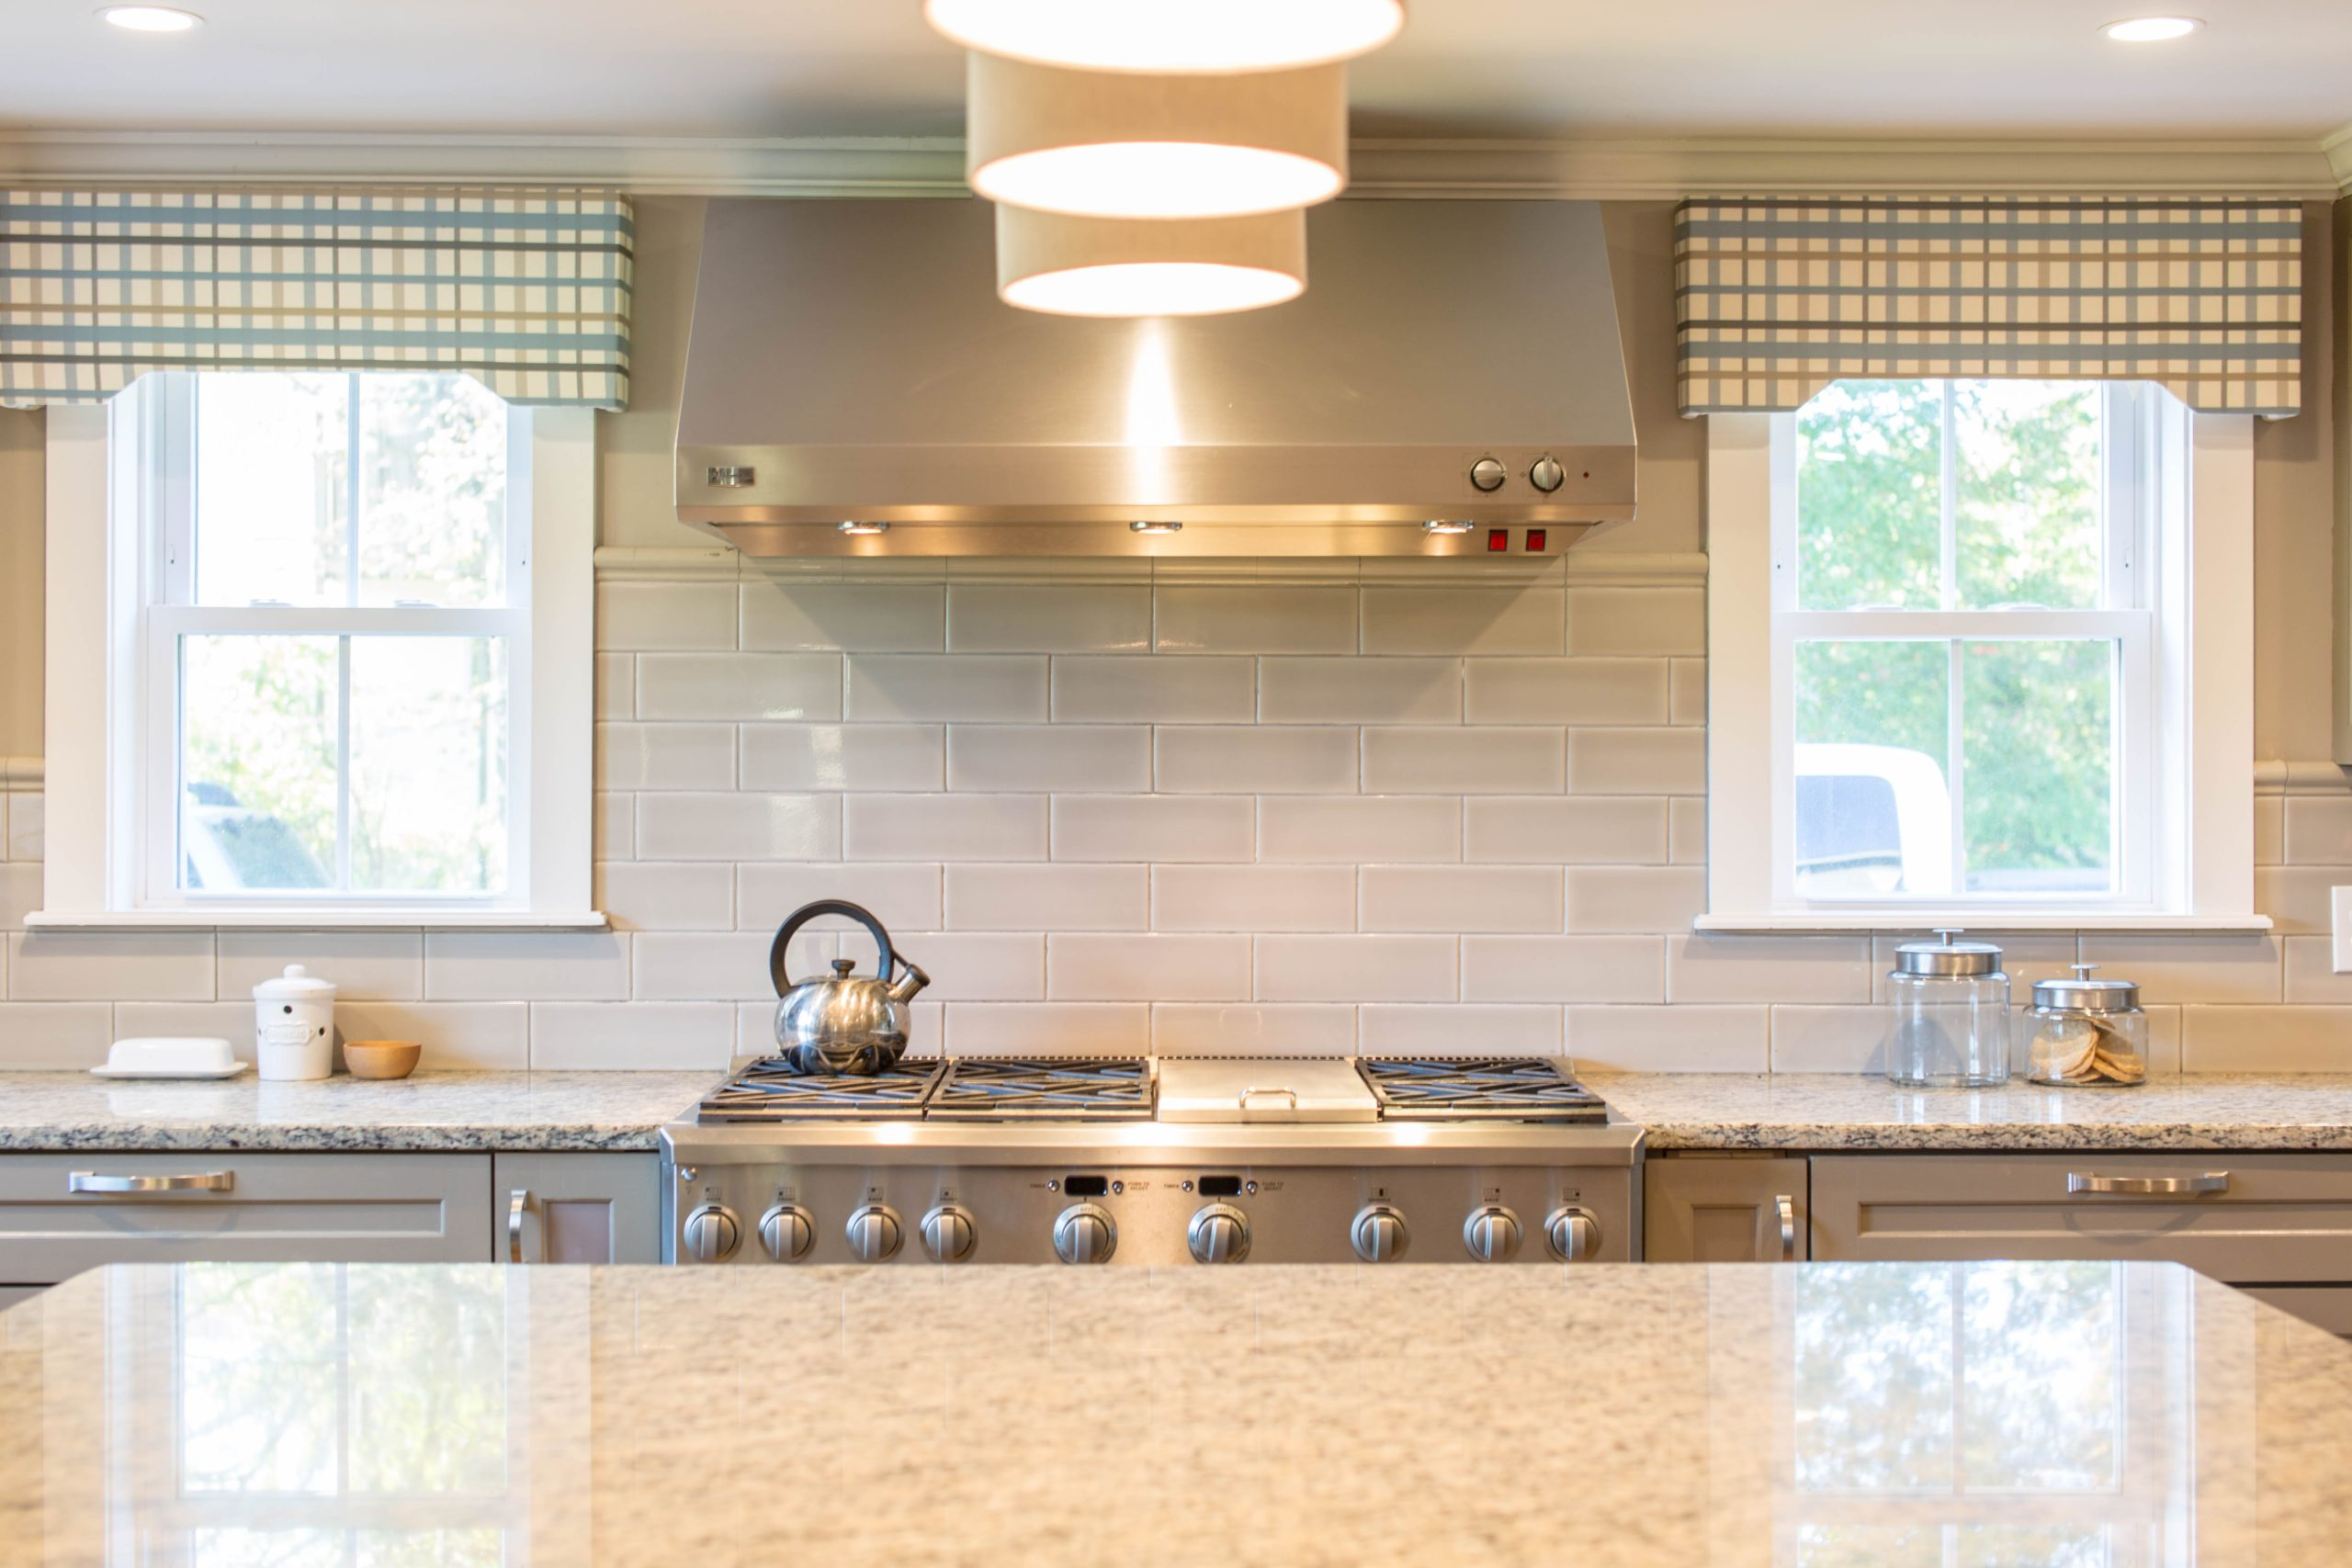 kitchen, appliances, open space